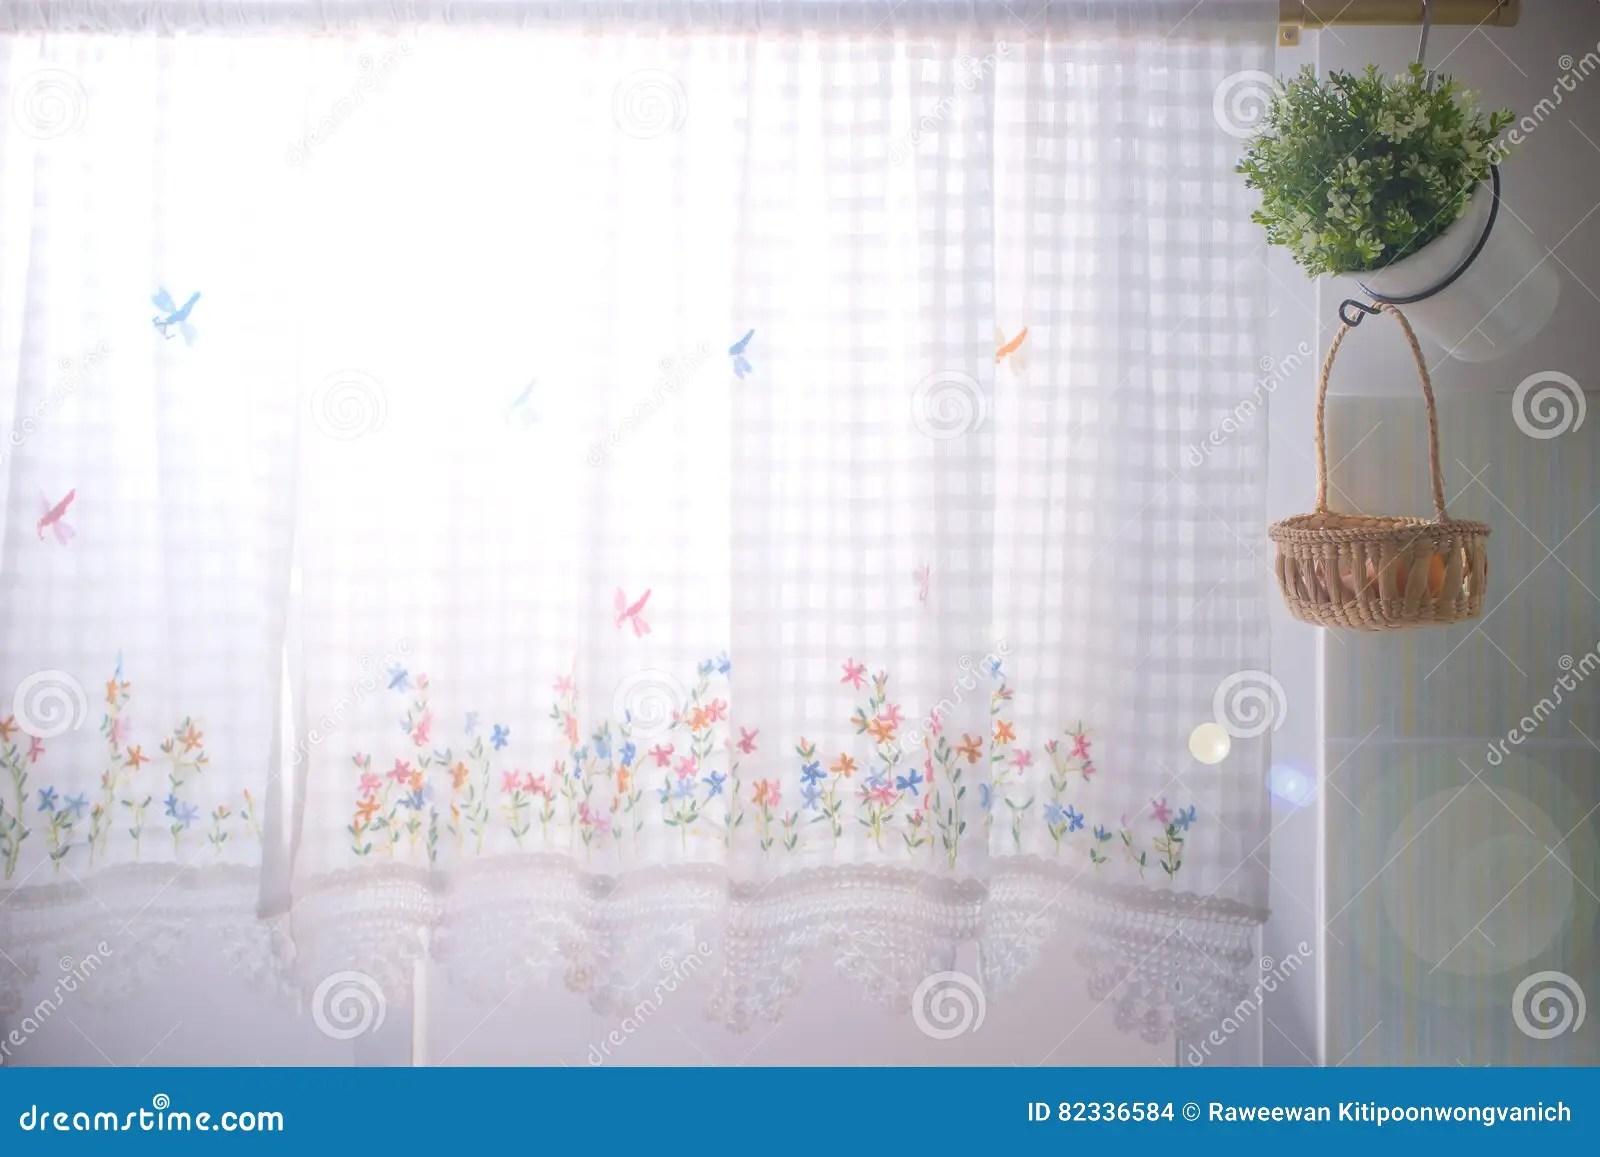 kitchen curtains for sale delta faucet repair parts 厨房窗口穿戴了与花边窗帘和花盆库存例证 插画包括有作用 夏天 室内 厨房窗口穿戴与花边窗帘和花盆 有太阳火光作用的